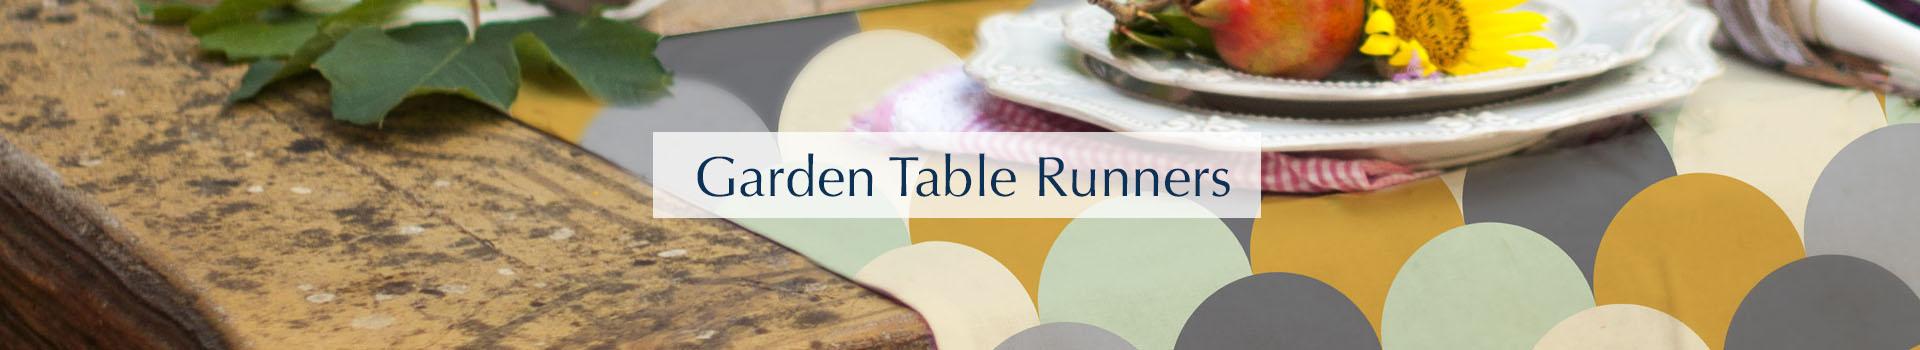 garden-table-runners-copy-2.jpg